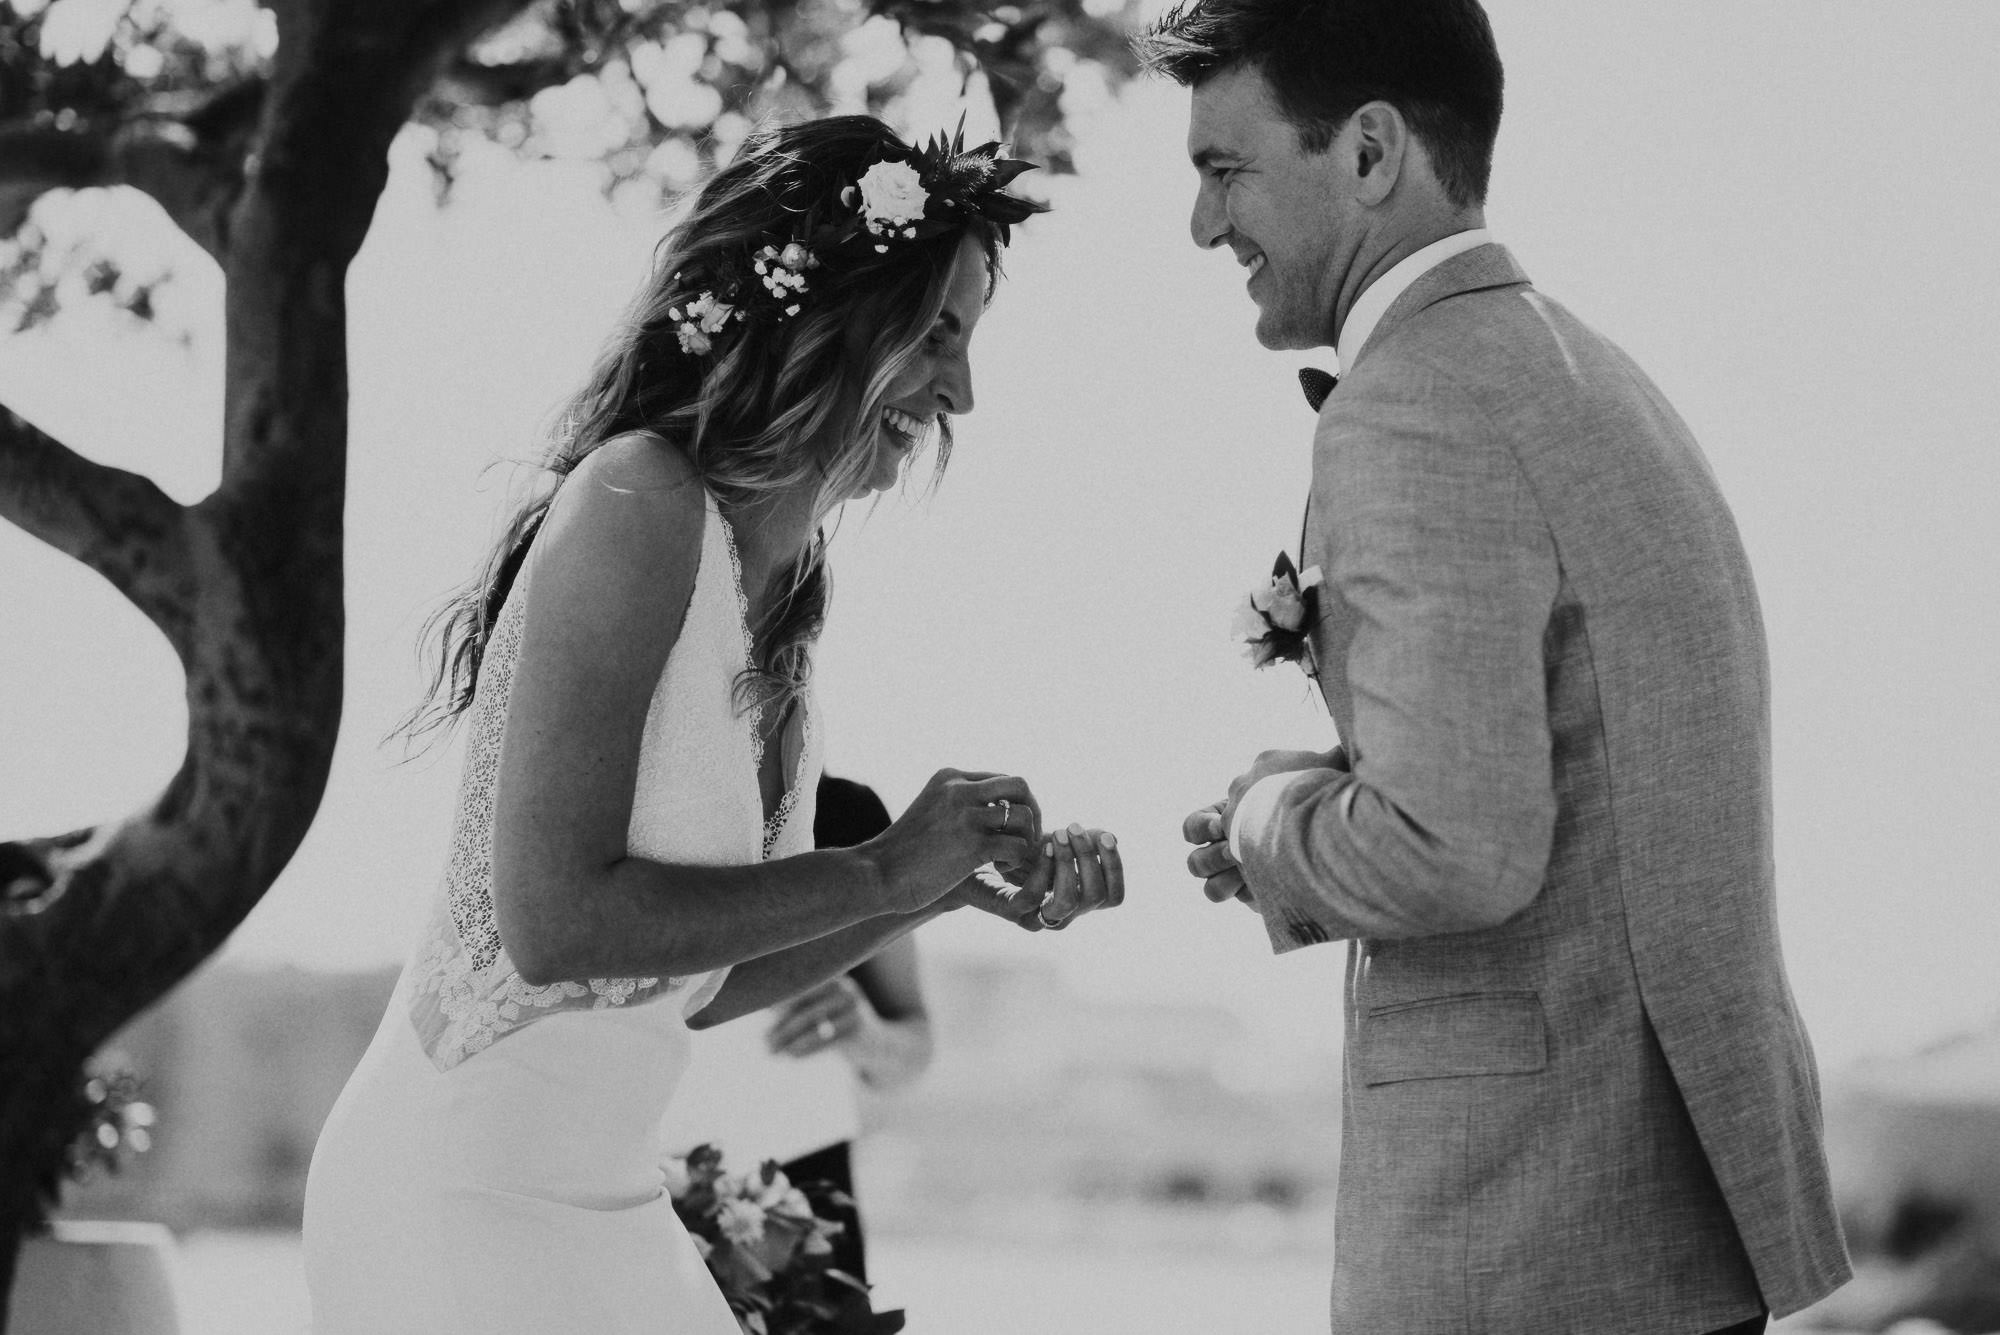 dubrovnik_croatia_wedding_photographer-jere_satamo-destination_weddings-042-web.jpg